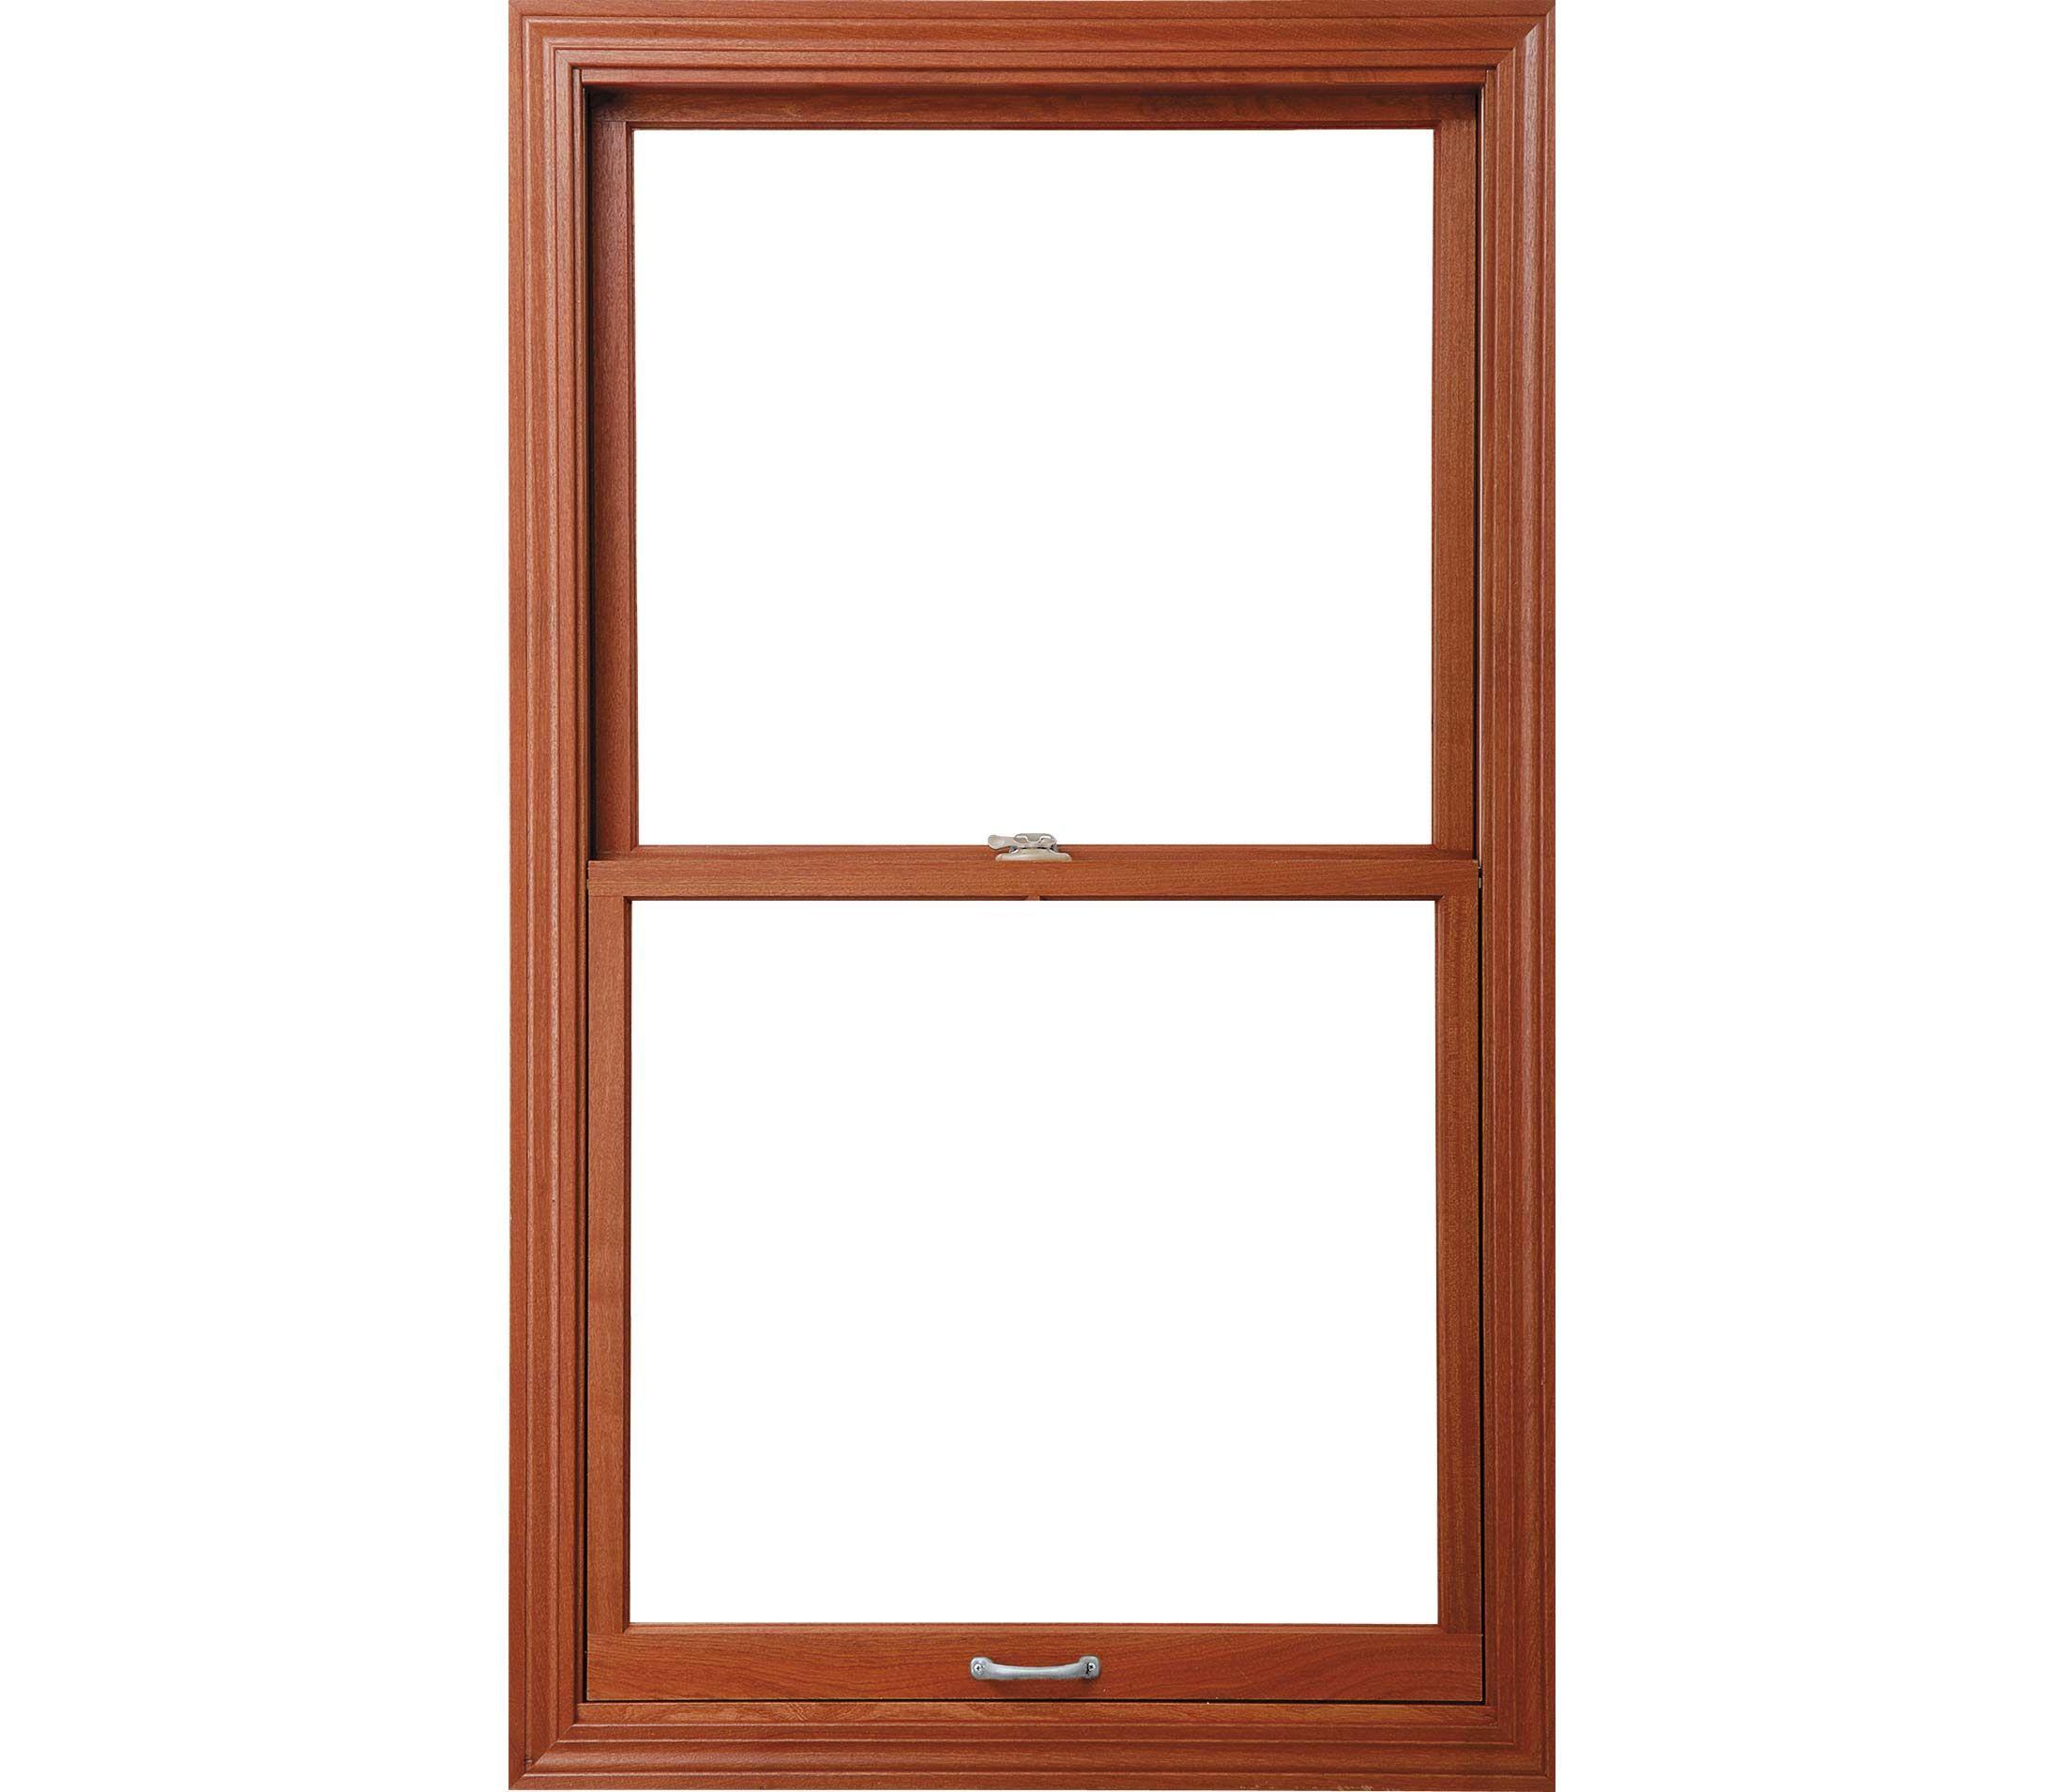 Http Www Manufacturedhomerepairtips Com Windowreplacementoptions